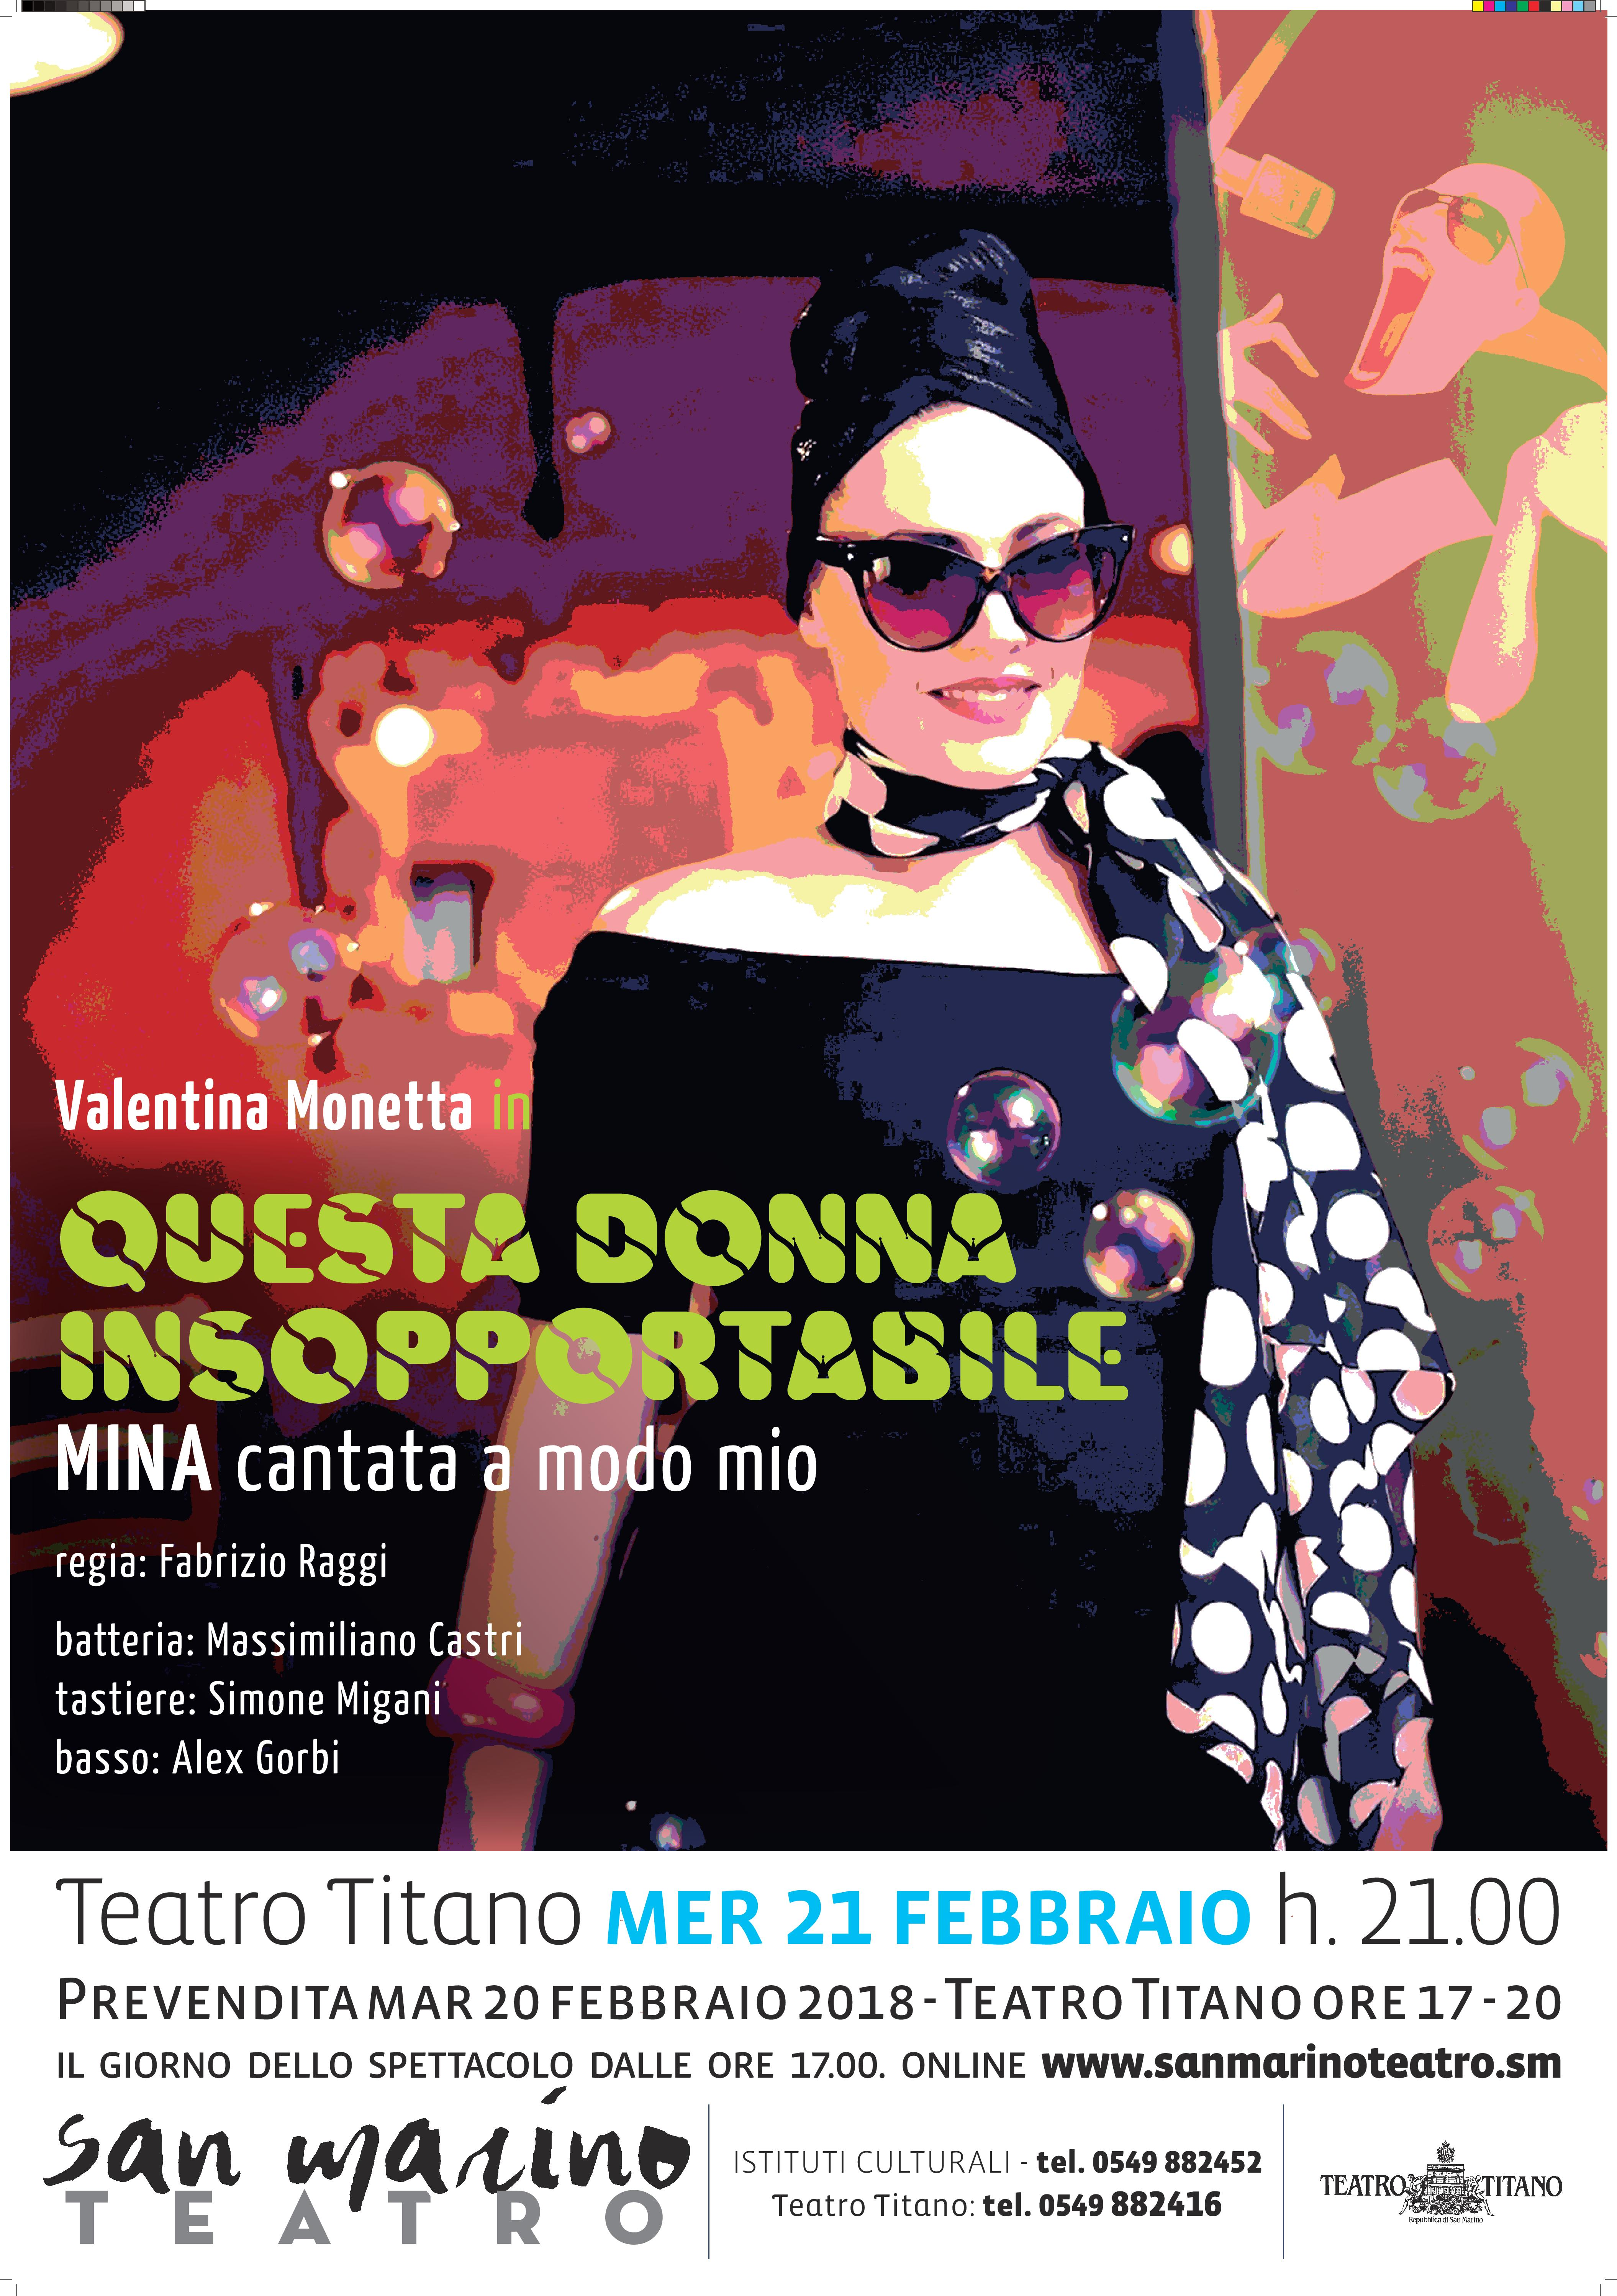 Valentina Monetta canta Mina